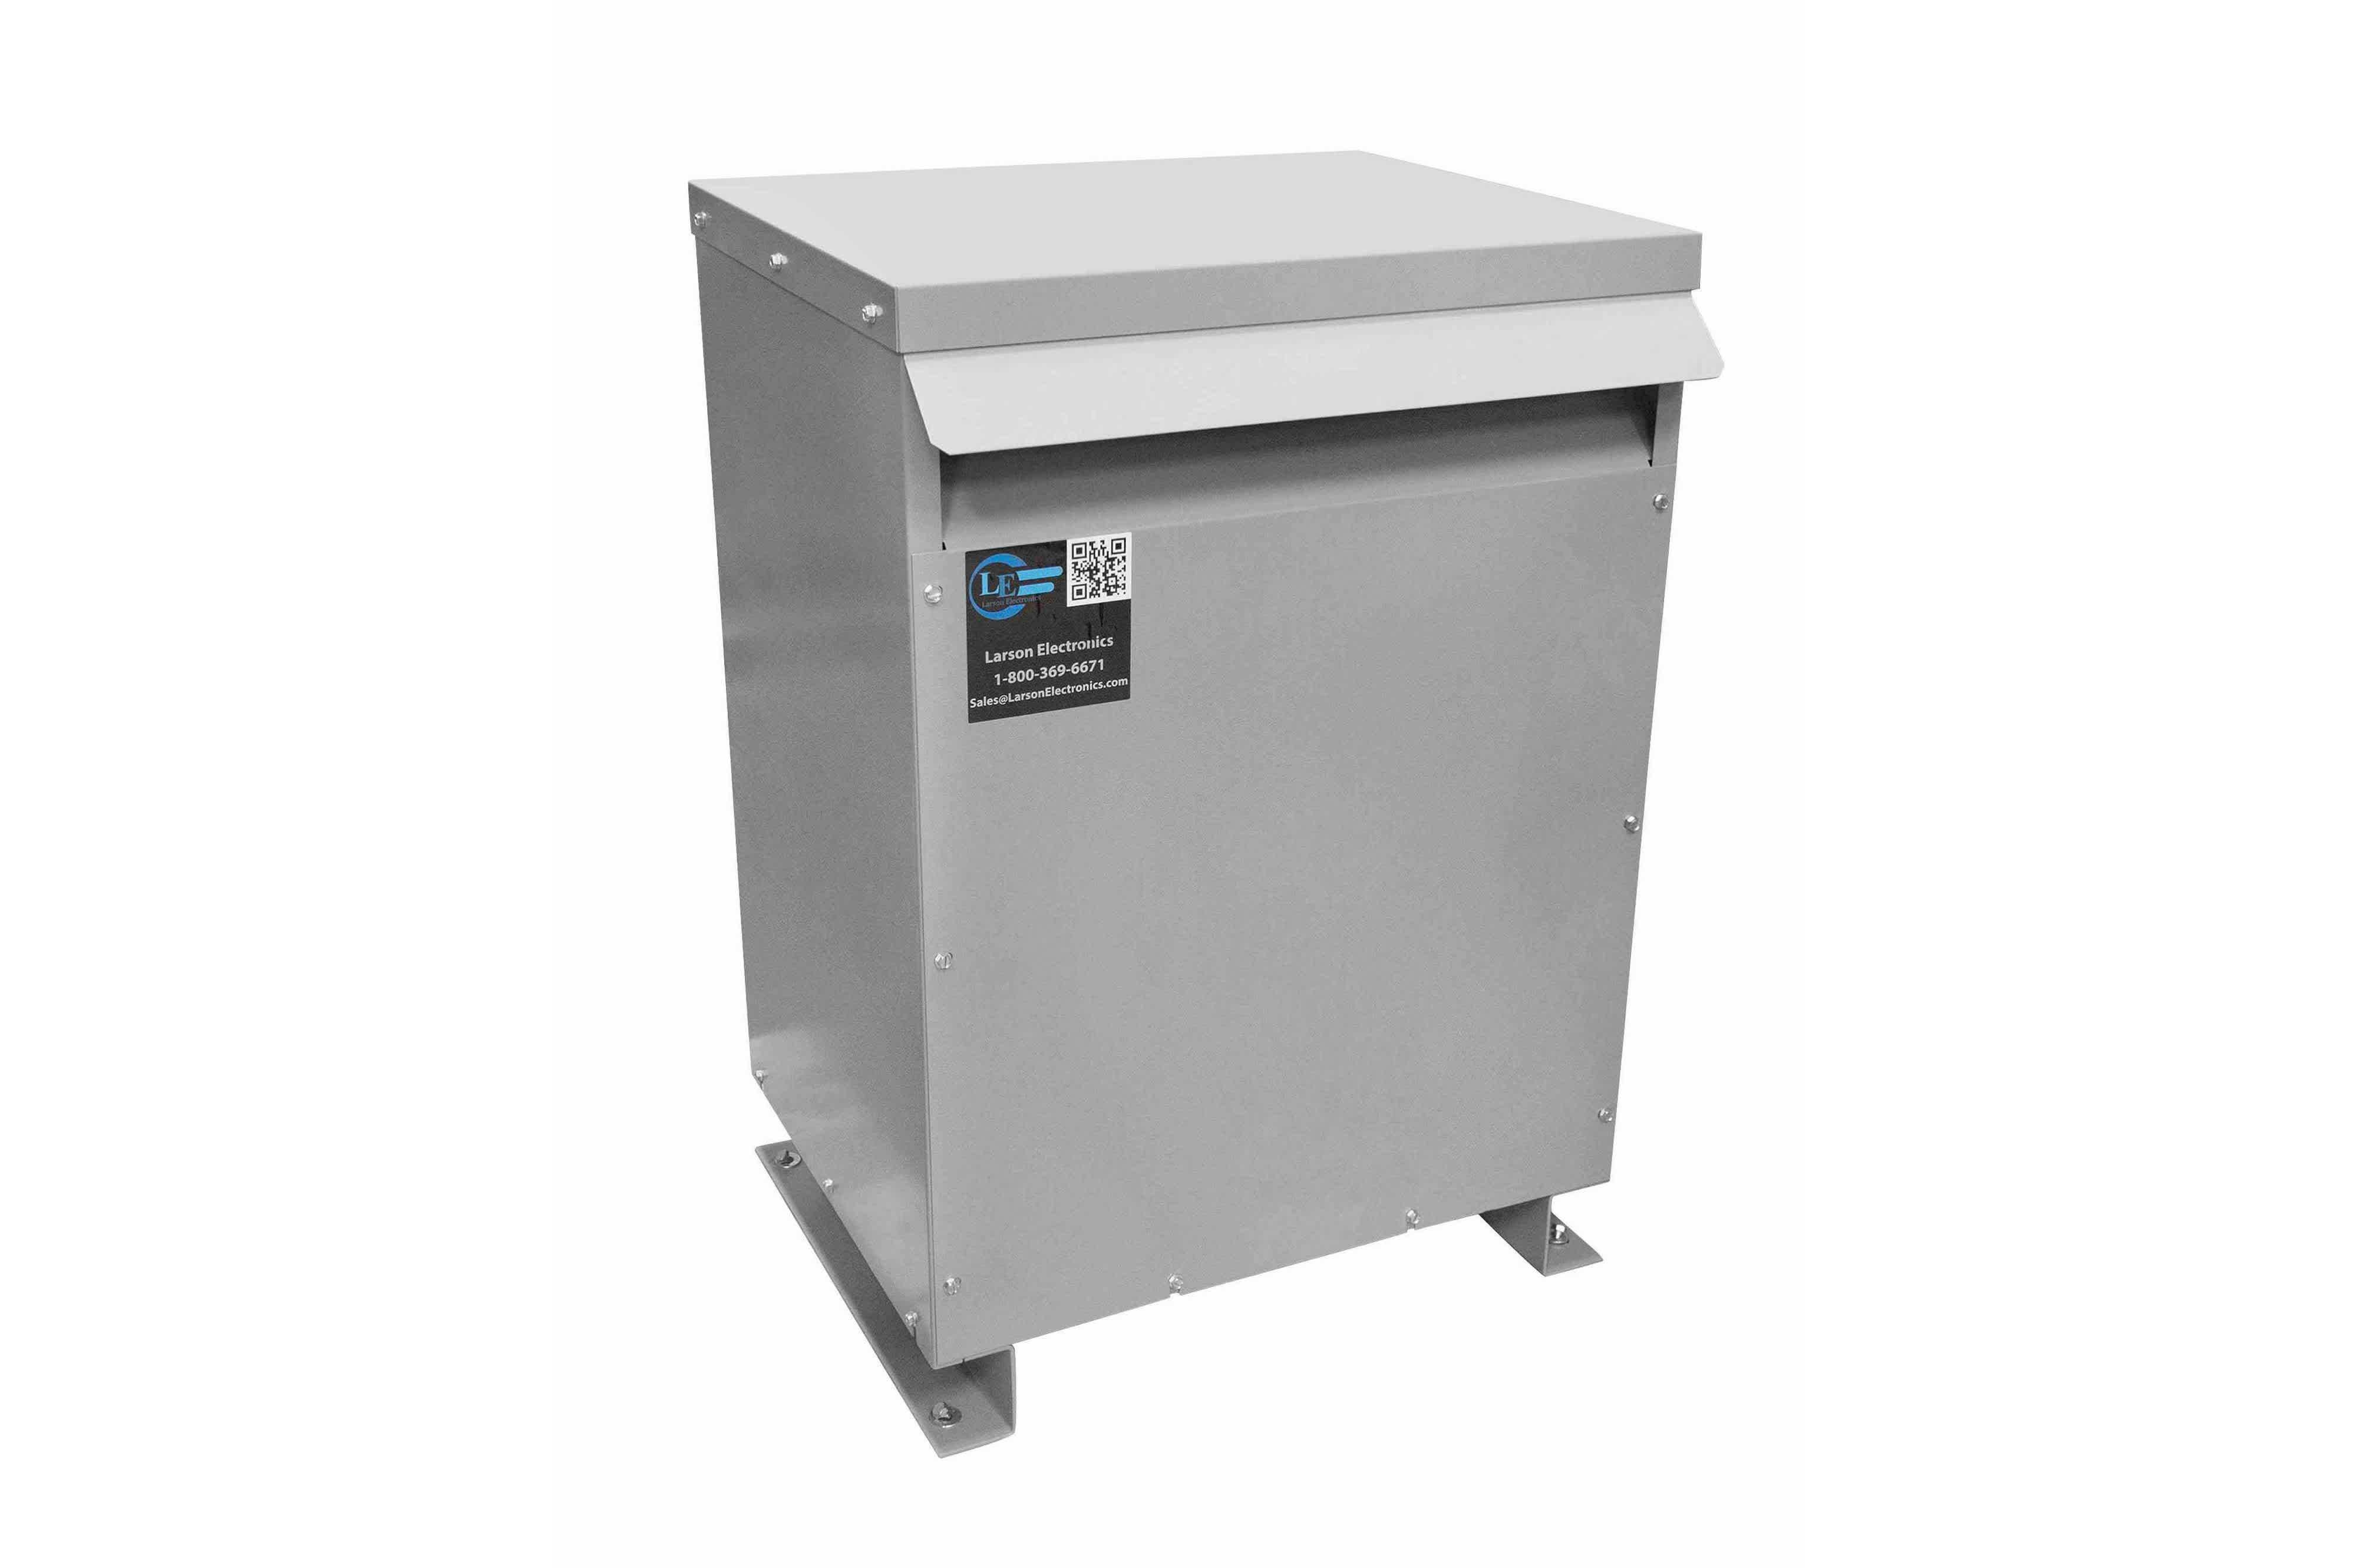 500 kVA 3PH Isolation Transformer, 480V Wye Primary, 240V Delta Secondary, N3R, Ventilated, 60 Hz